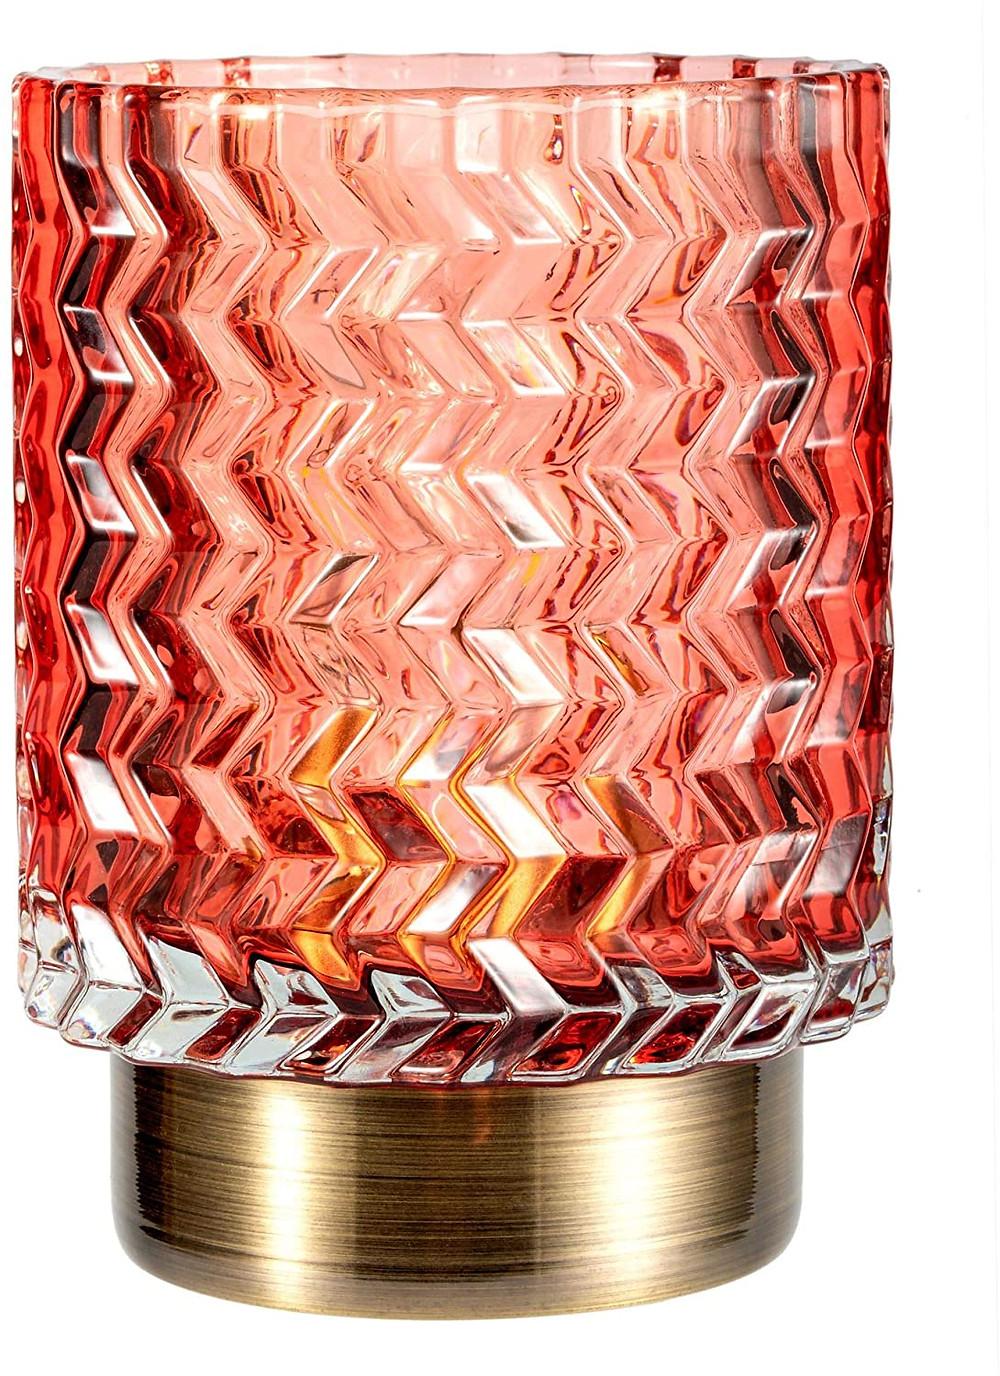 Lampe à piles en verre rouge rose orange